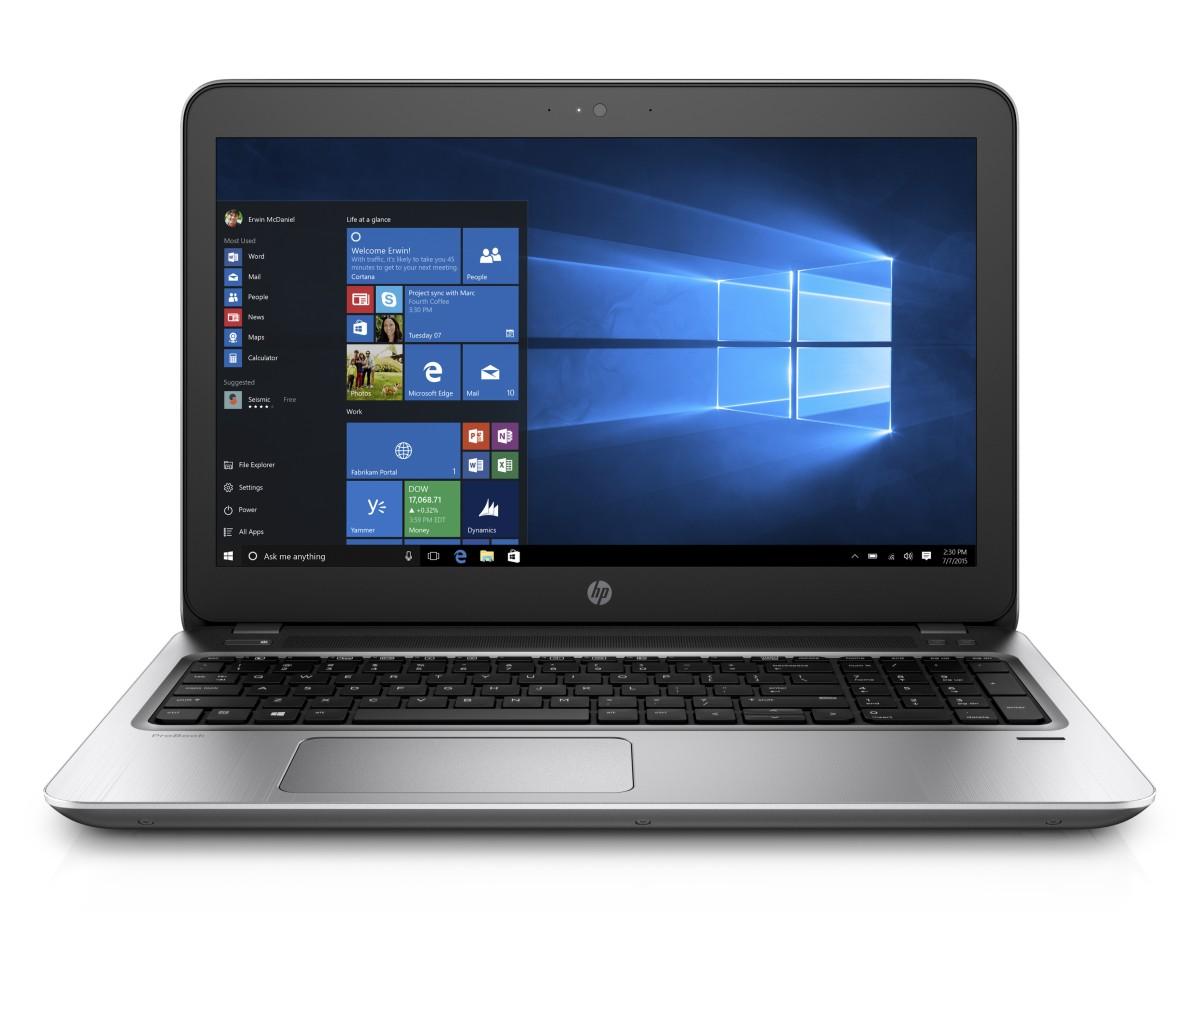 HP ProBook 450 G4 FHD/i7-7500U/8G/256/DVD/W10P